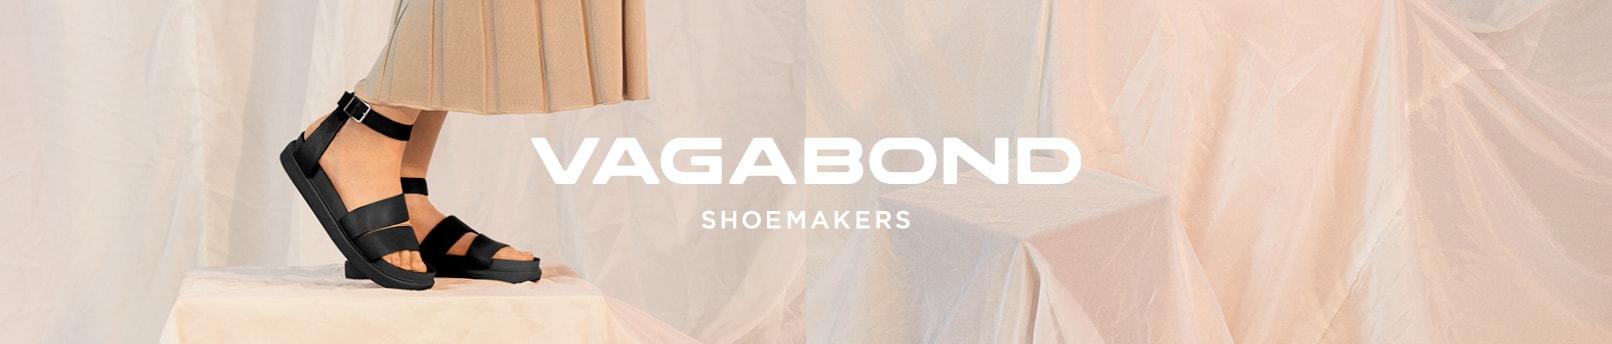 Shop Vagabond